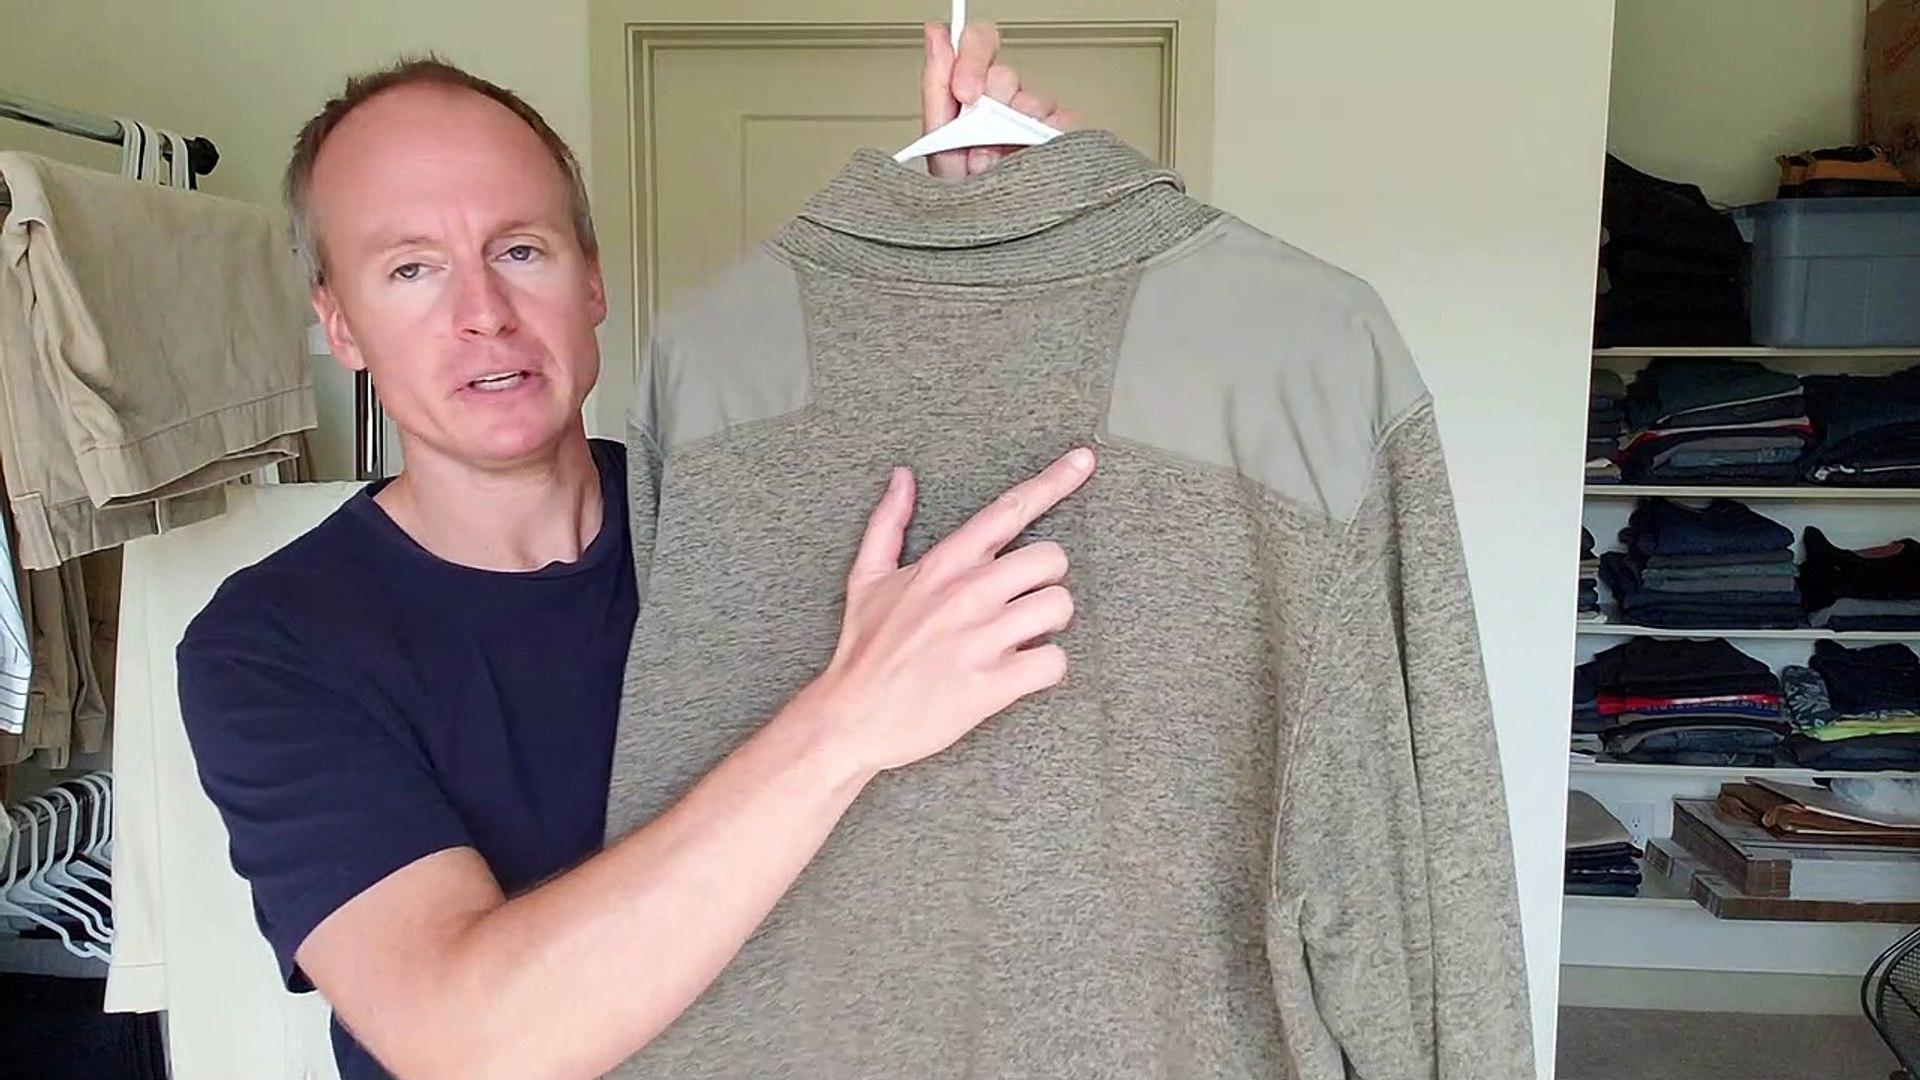 Jim Butler Sells Clothing On Ebay, Poshmark, and Mercari.